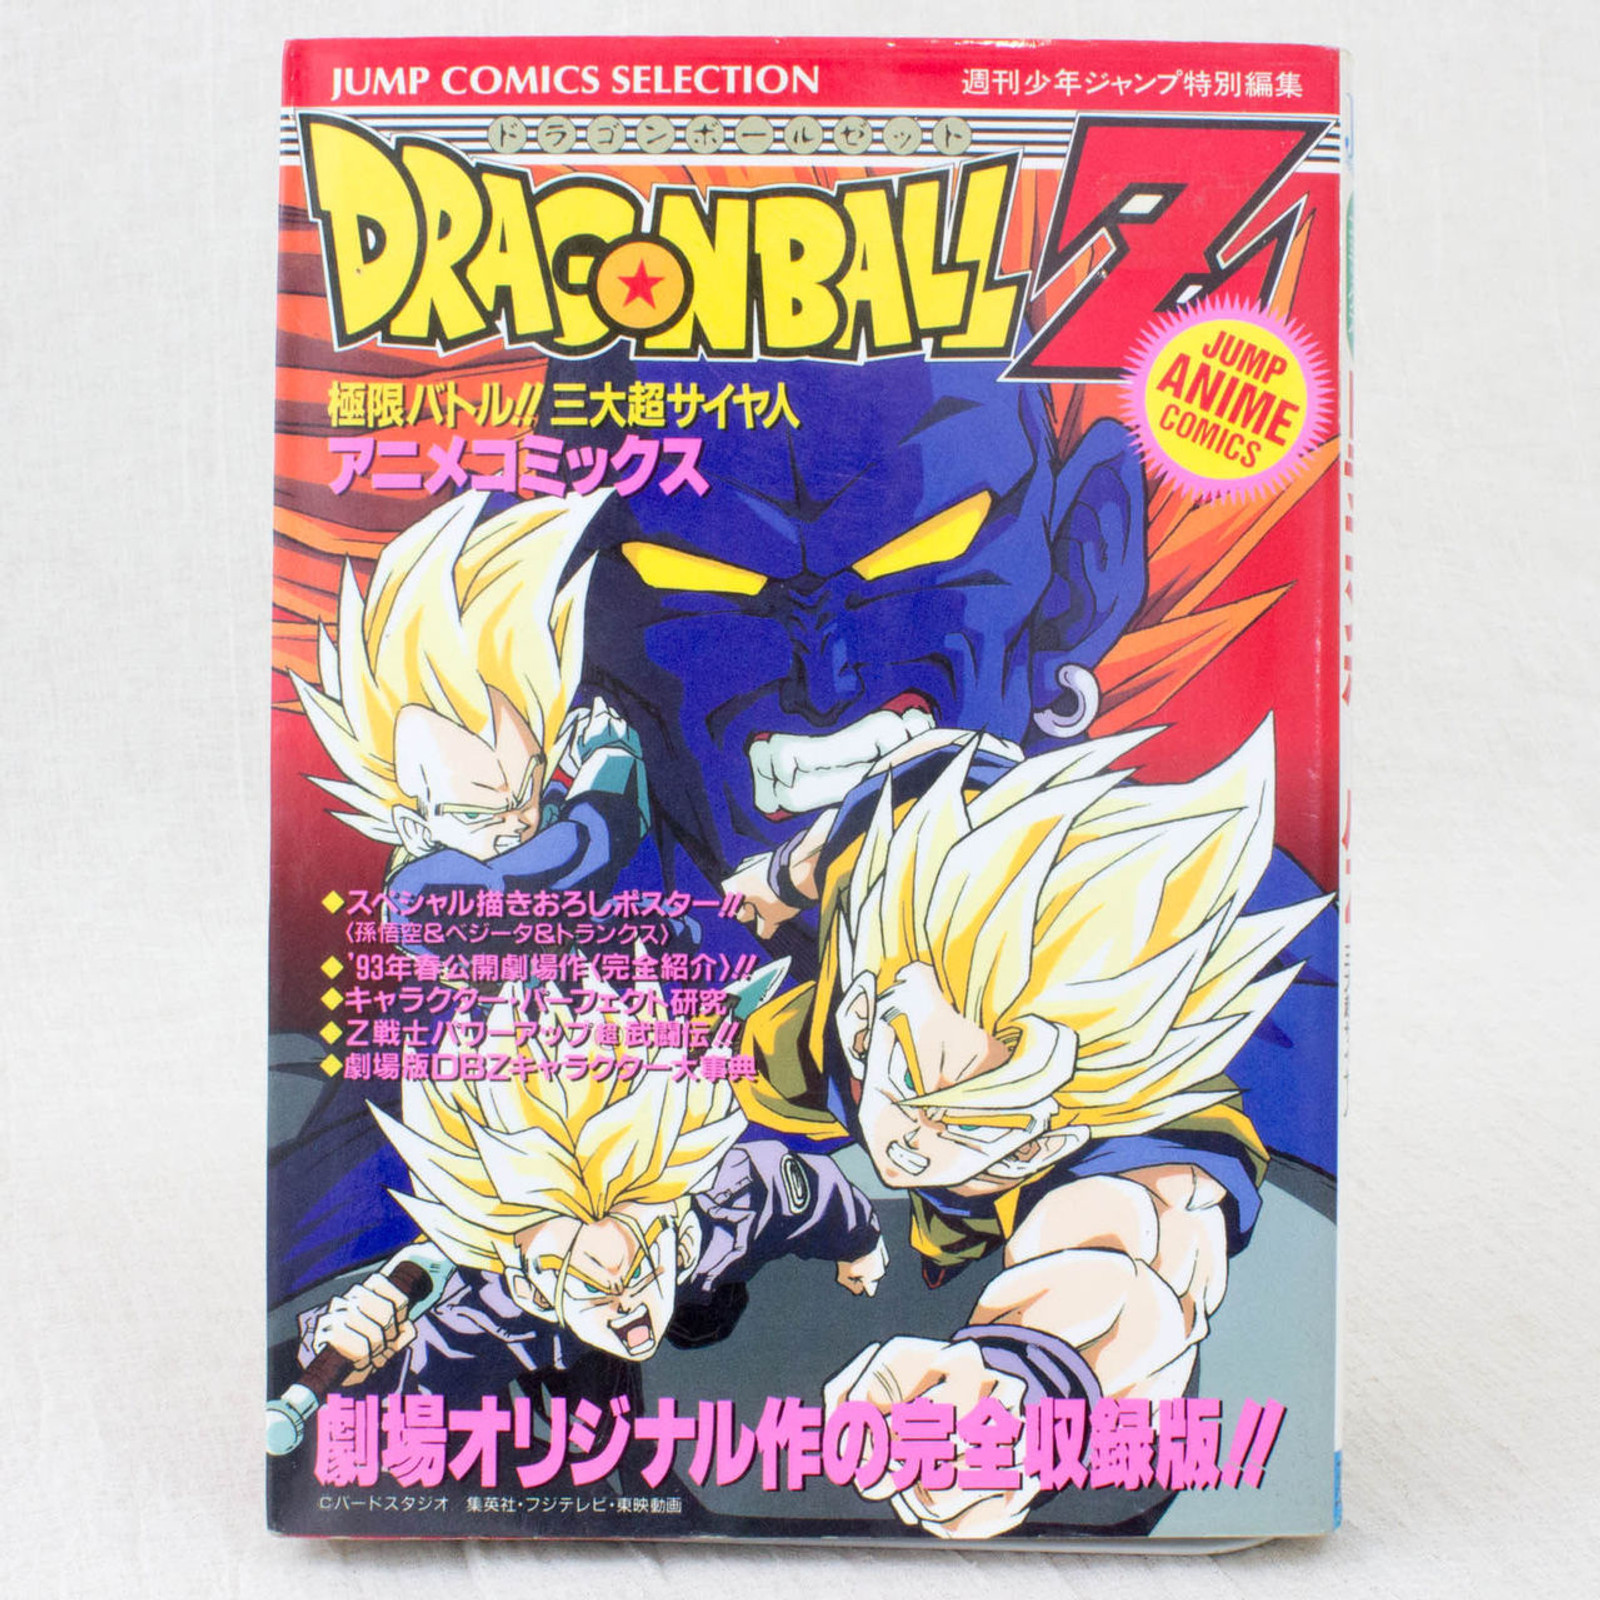 Dragon Ball Z Anime Movie Film Comics Book JAPAN ANIME MANGA 6